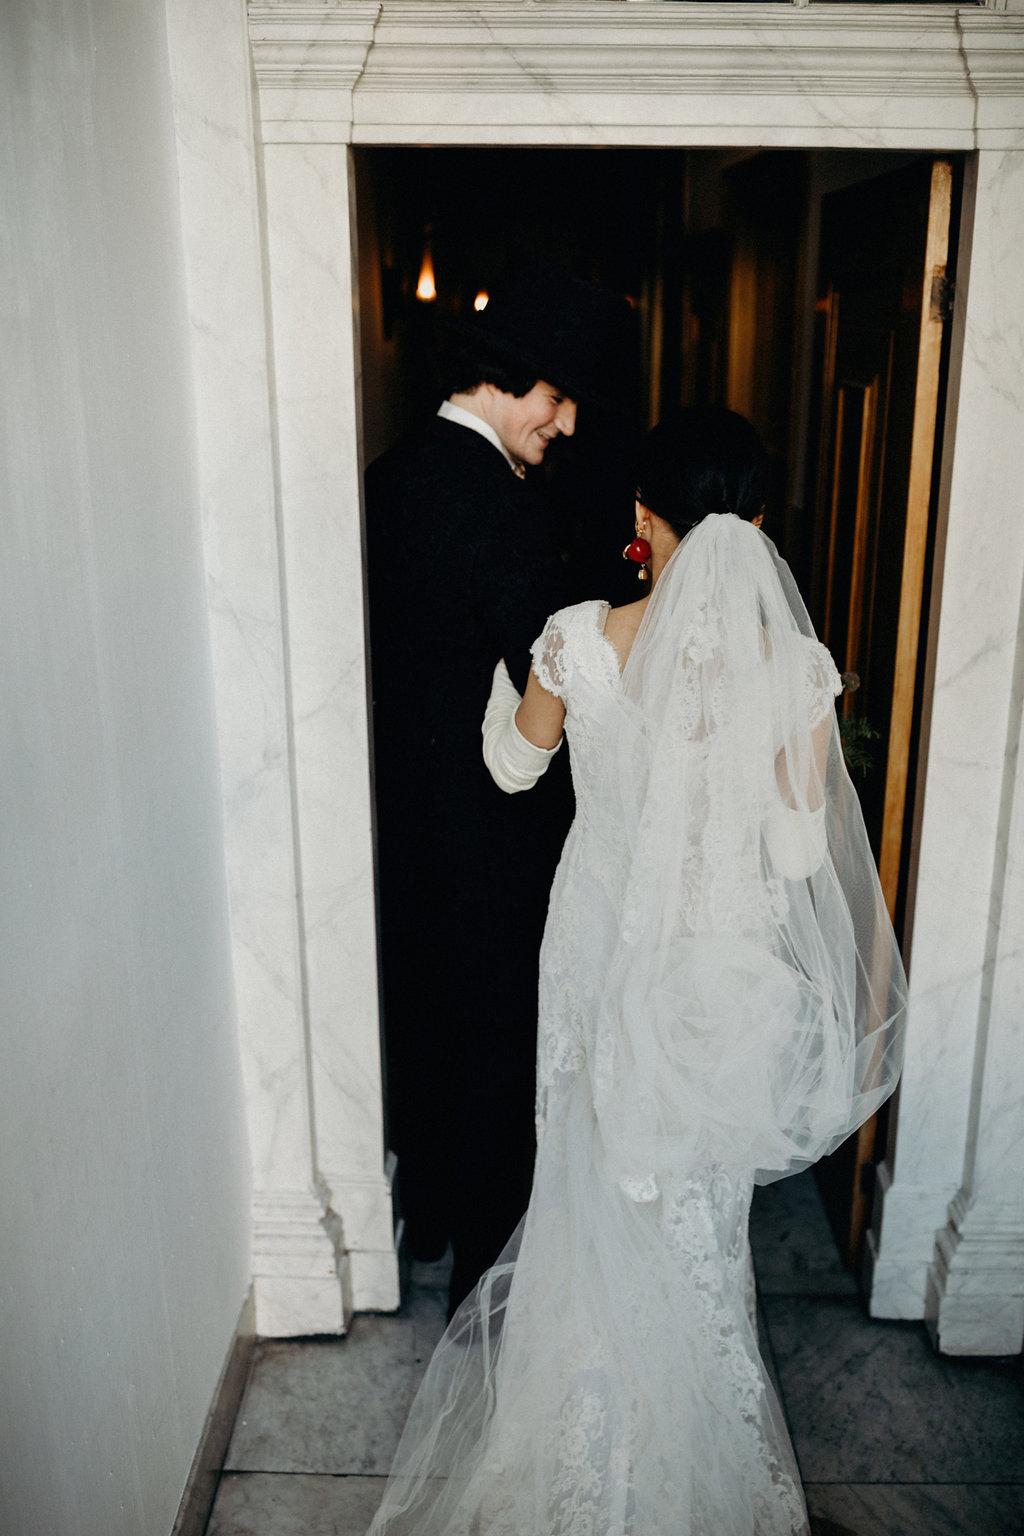 143-sjoerdbooijphotography-wedding-coen-janaina.jpg